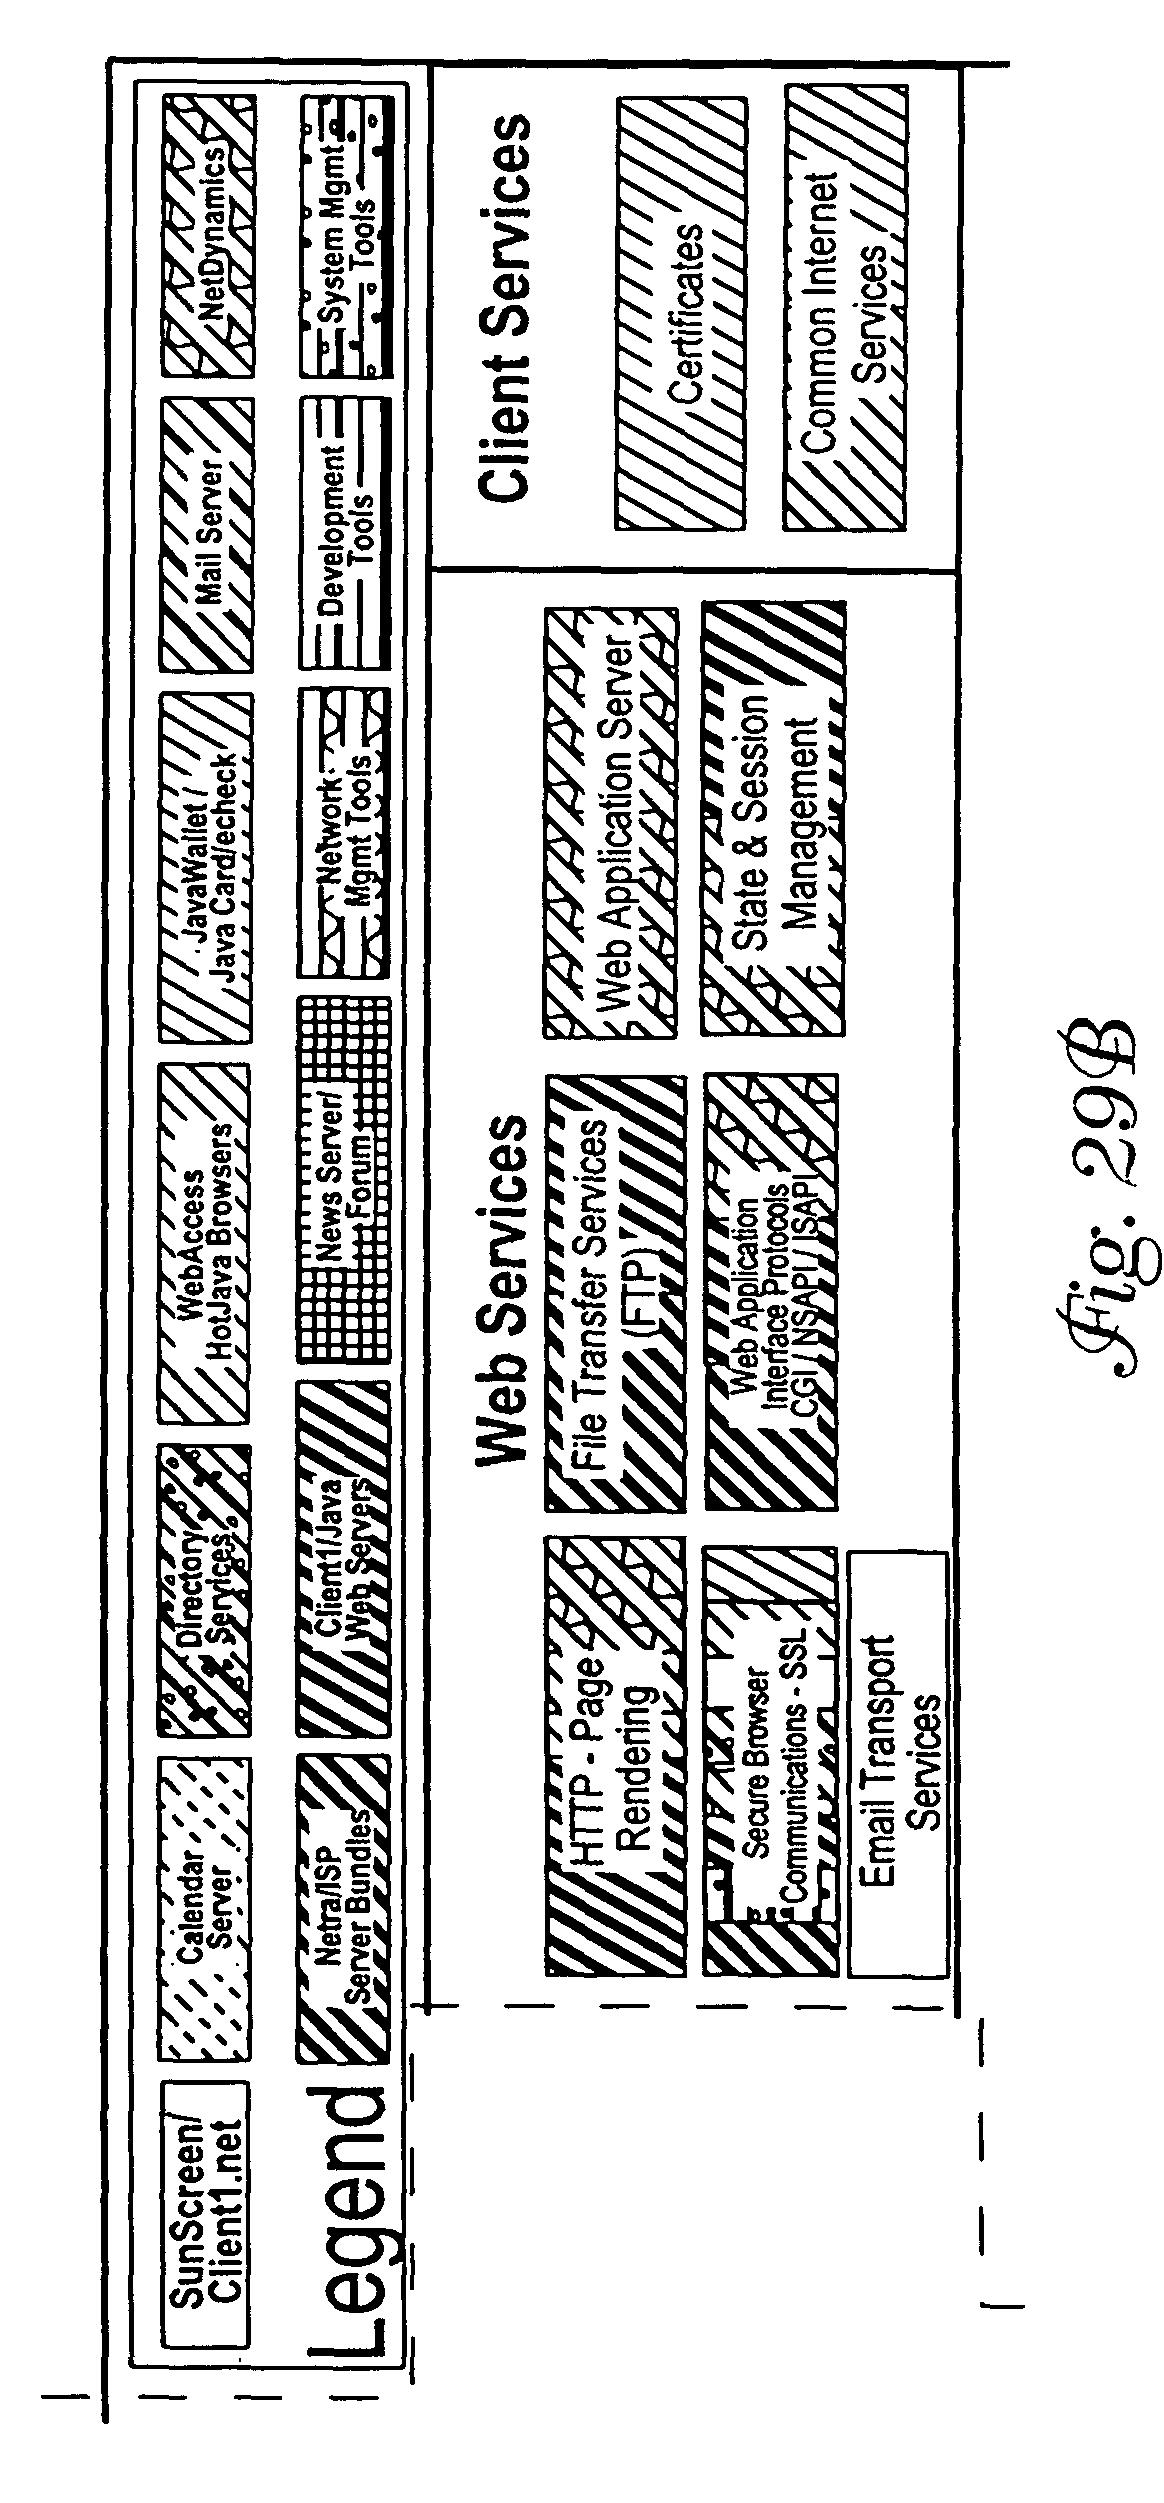 Patent US 20040107125A1